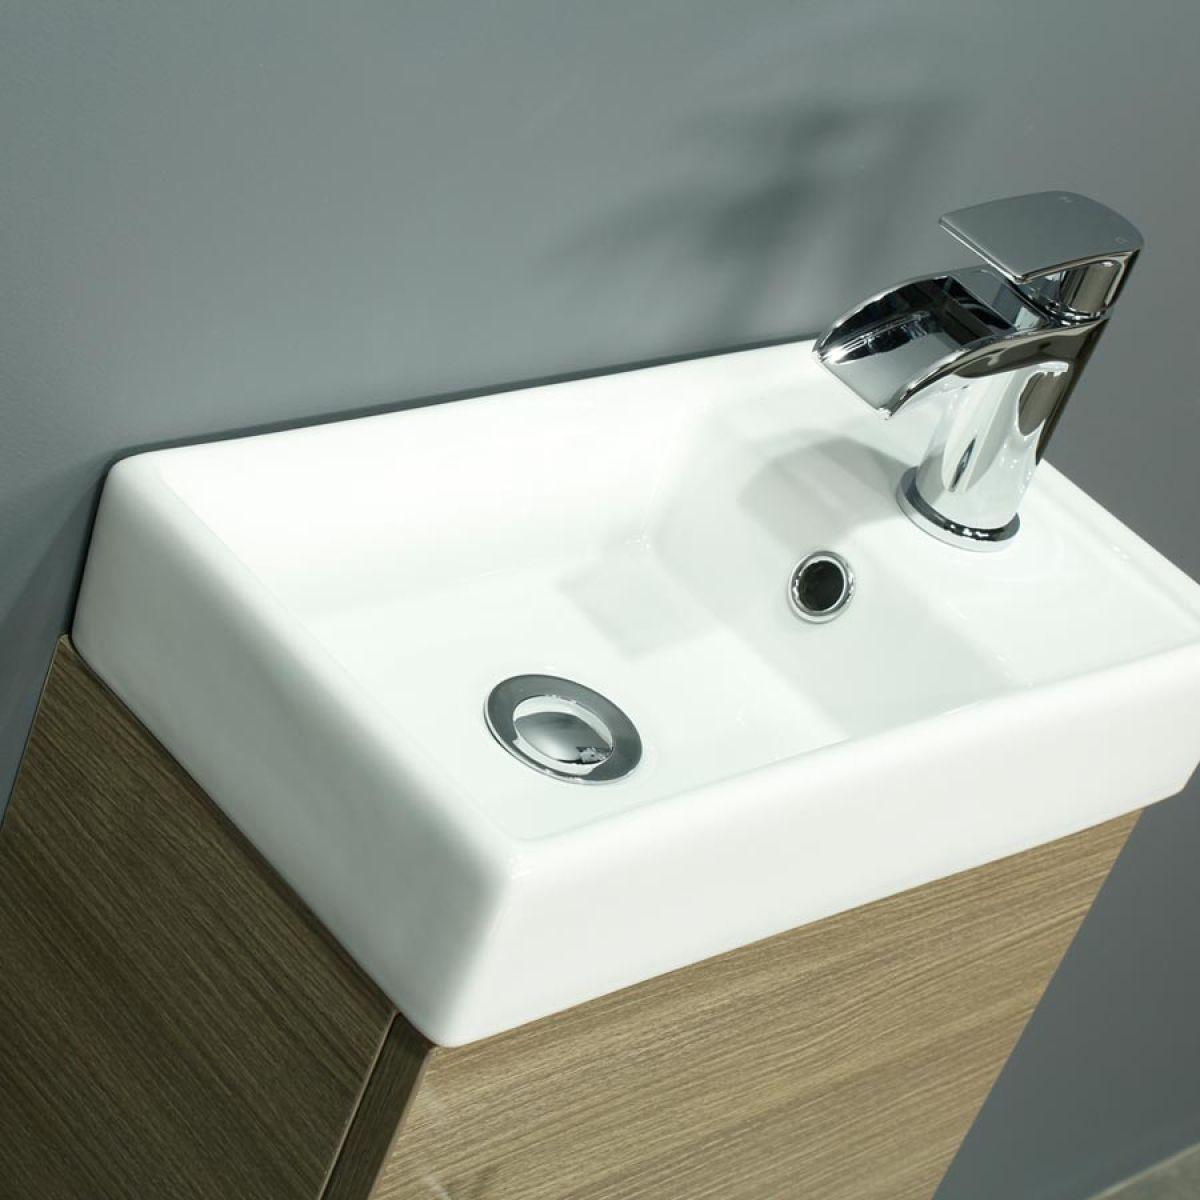 RAK Series 600 Back To Wall Toilet and 400 Series Walnut Vanity Unit Basin